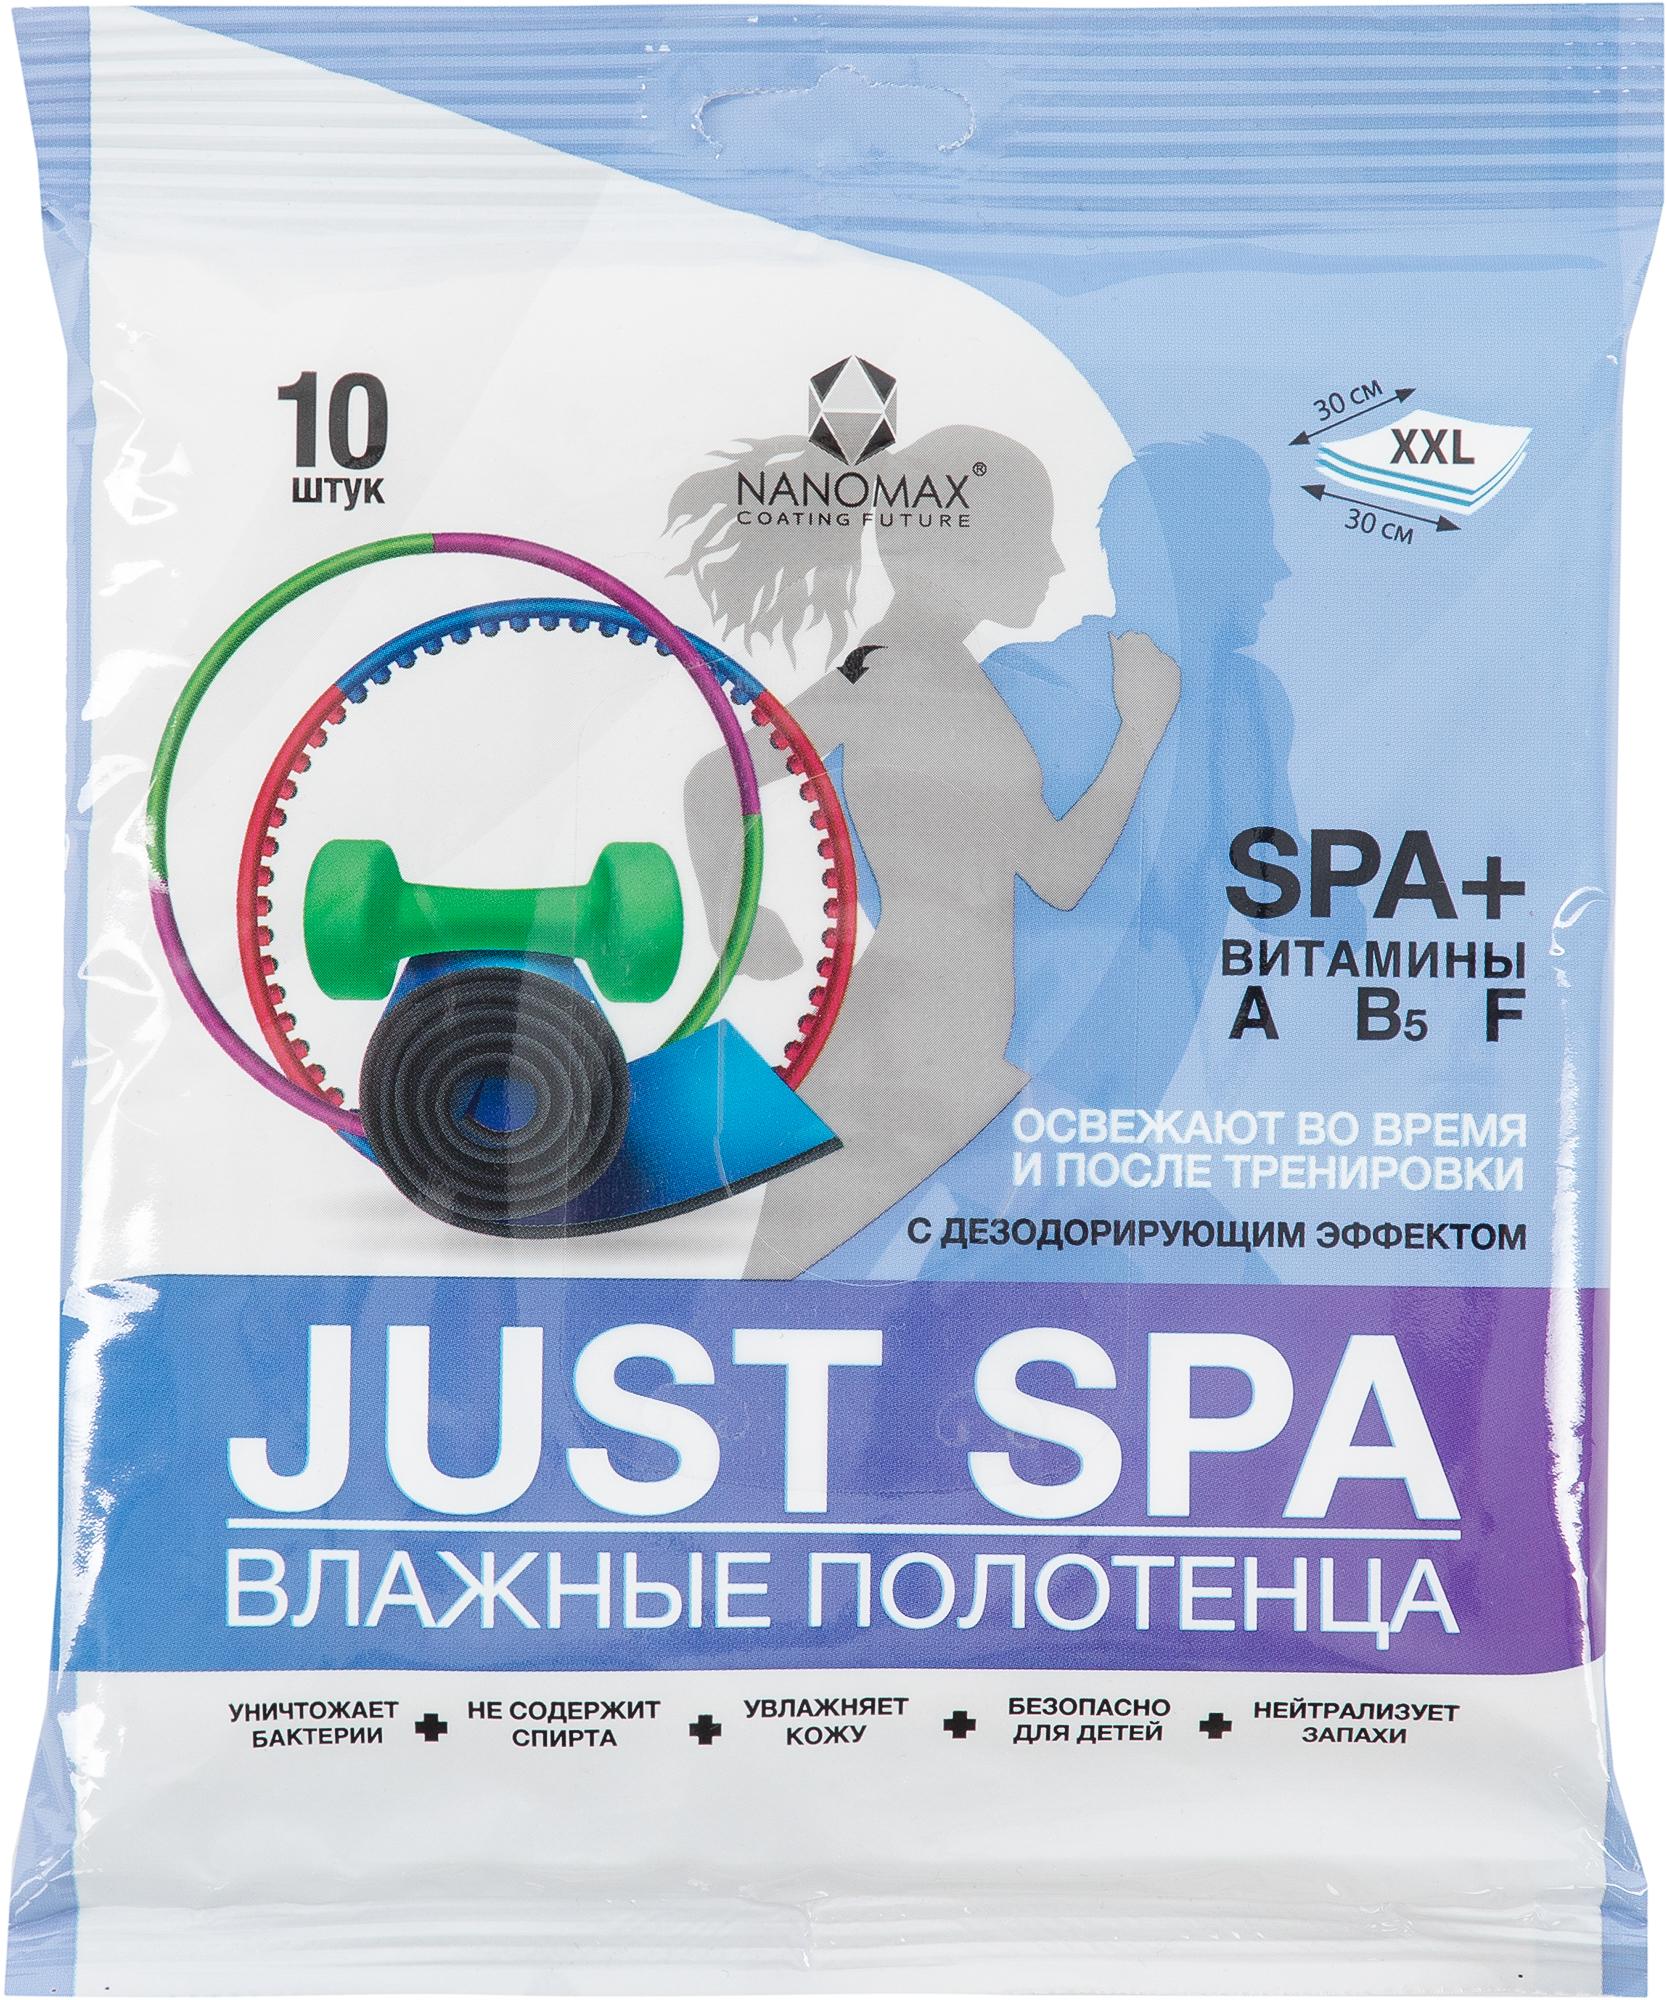 Nanomax Влажные полотенца Just Spa